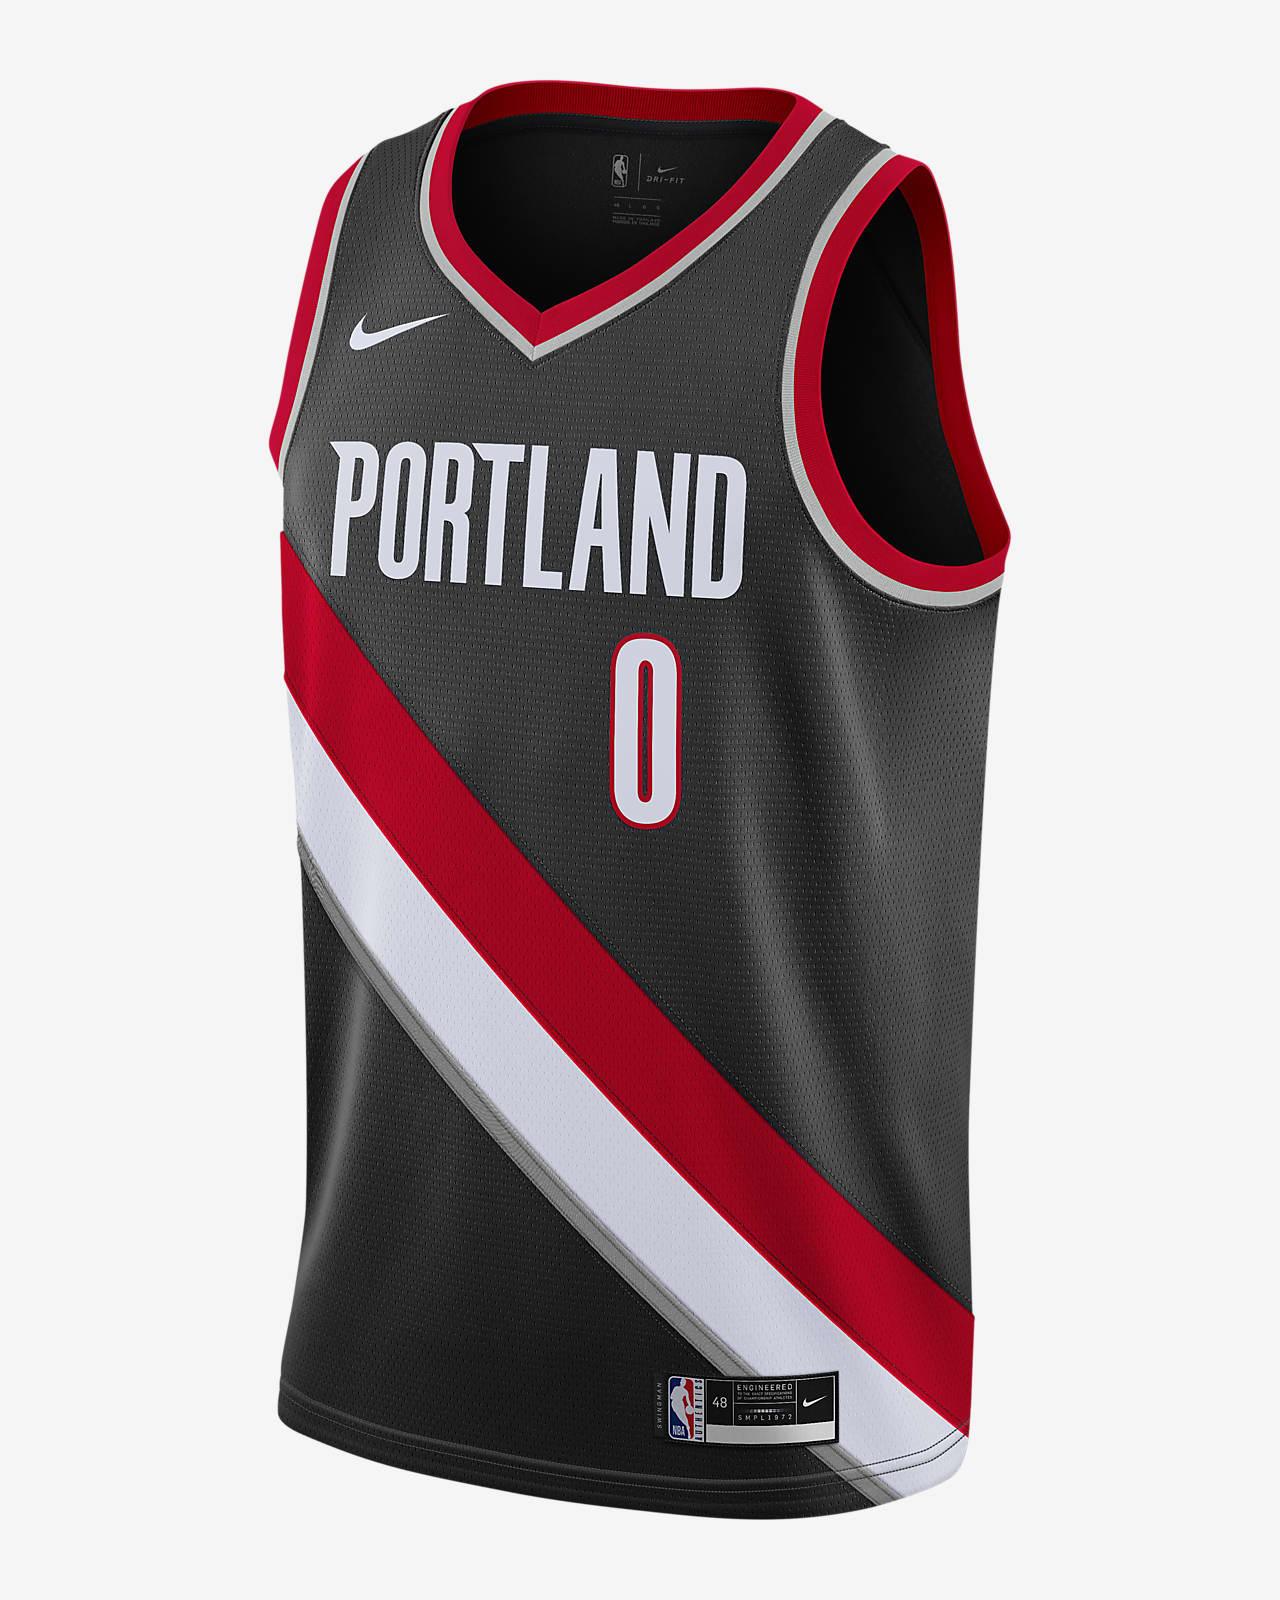 Maillot Nike NBA Swingman Damian Lillard Trail Blazers Icon Edition 2020